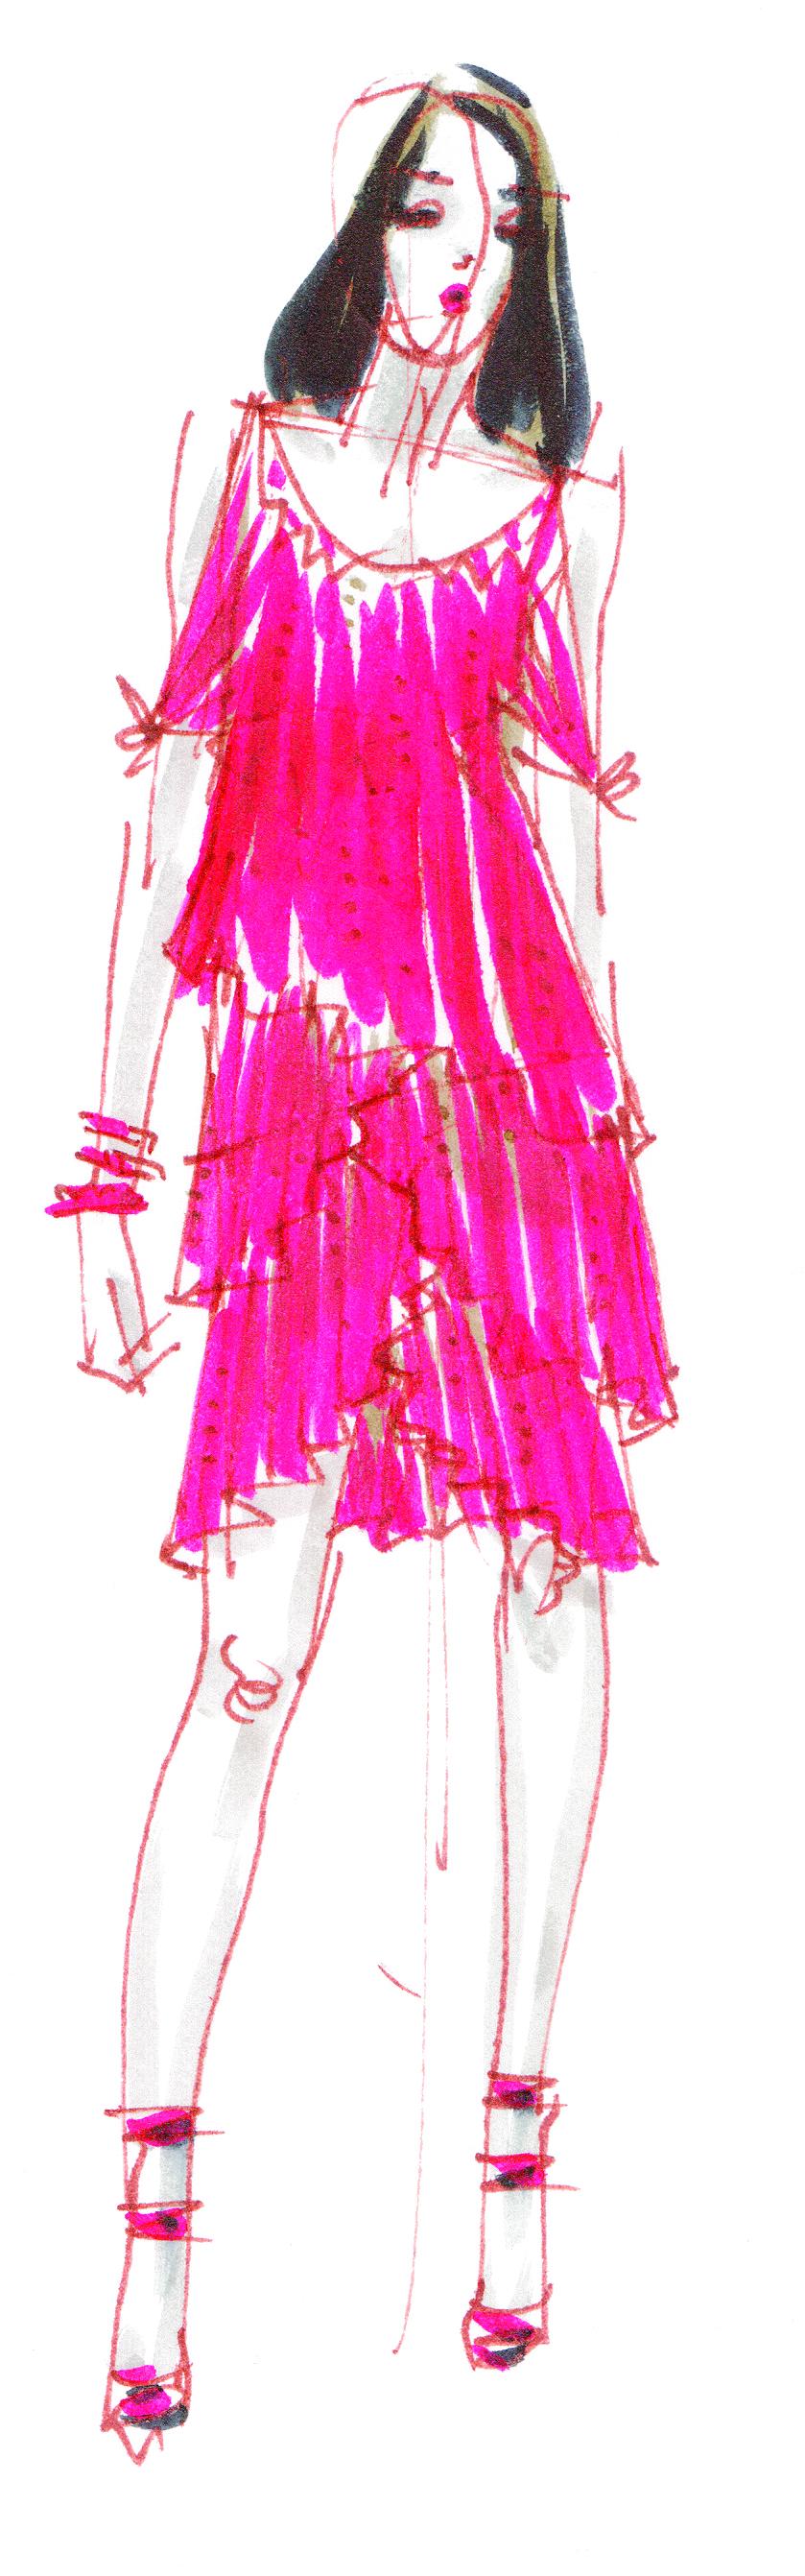 Fashion illustration by Yelen Aye